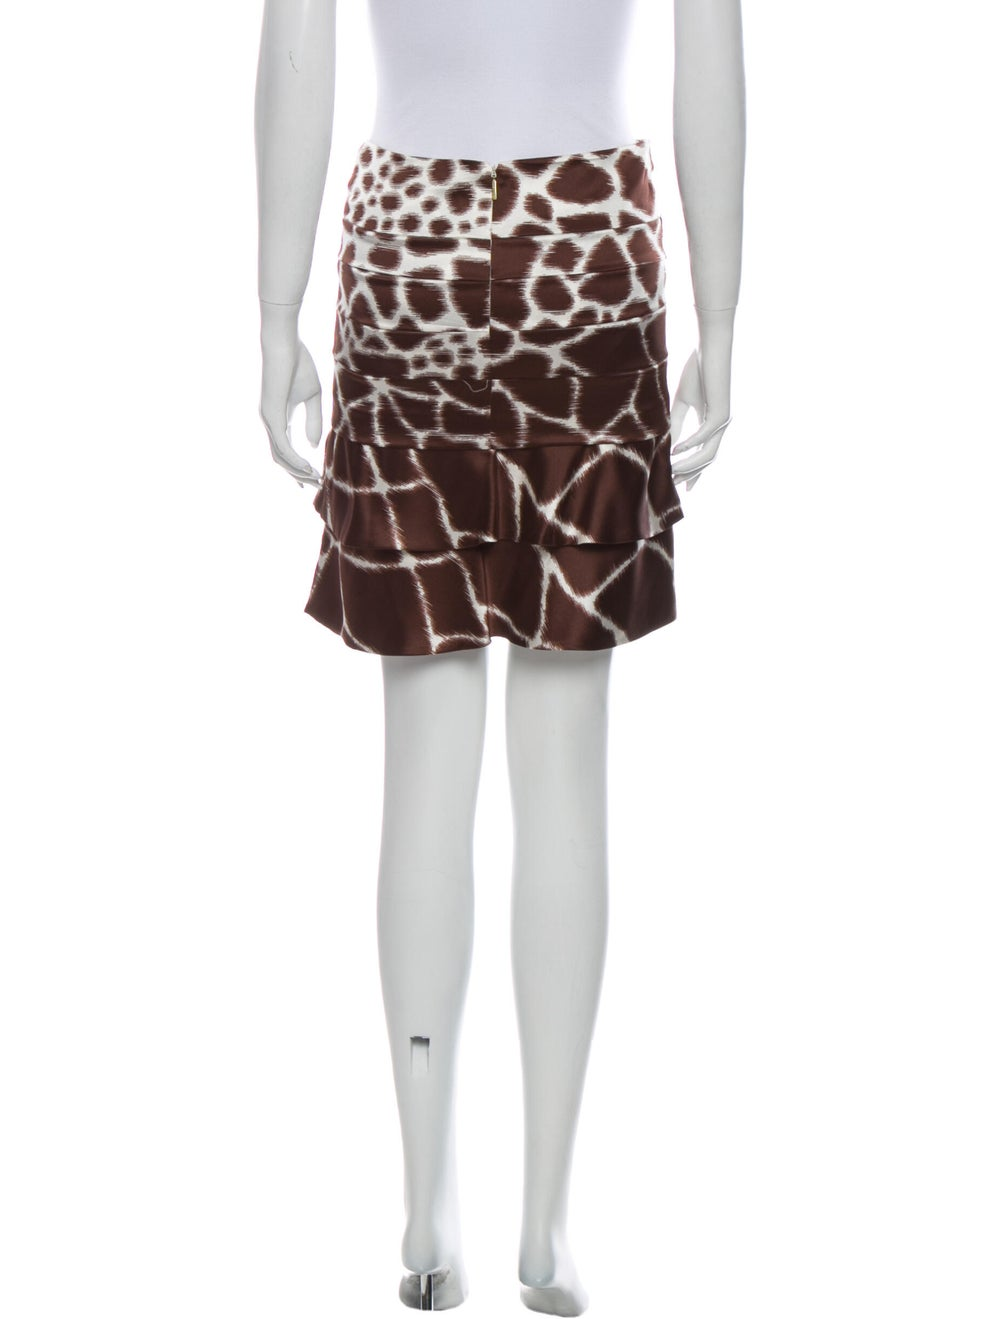 Roberto Cavalli Silk Mini Skirt Brown - image 3